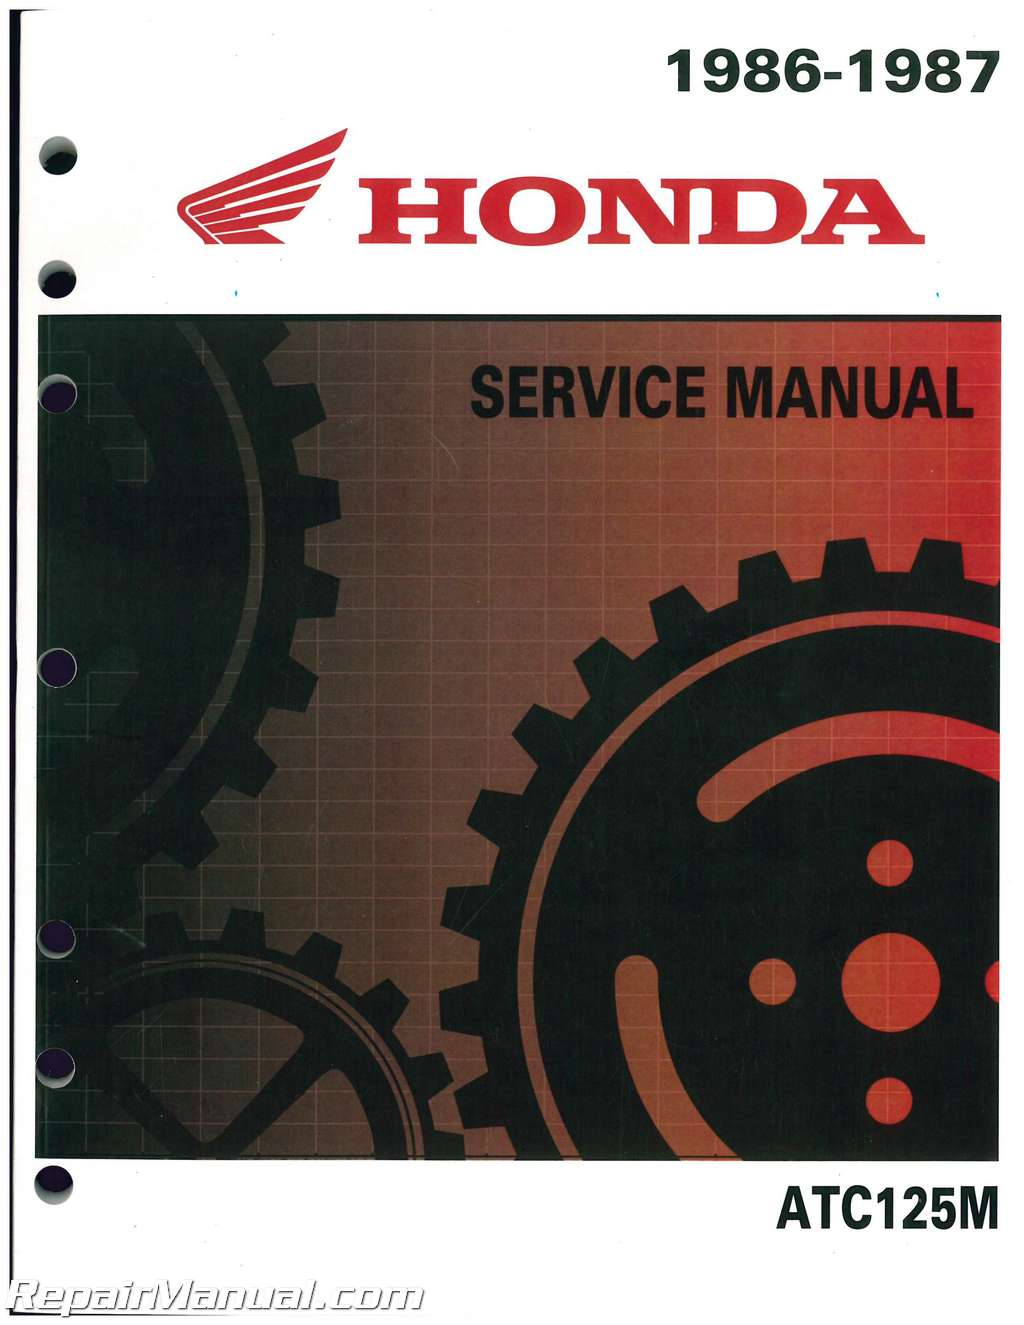 Honda Xr250 Wiring Diagram besides Wiring Diagram Honda Cbr1100xx additionally Wiring Diagram Honda Cbr1100xx moreover 1986 1987 Honda Atc125m Service Manual moreover 231964862884. on honda atc125m wiring diagram